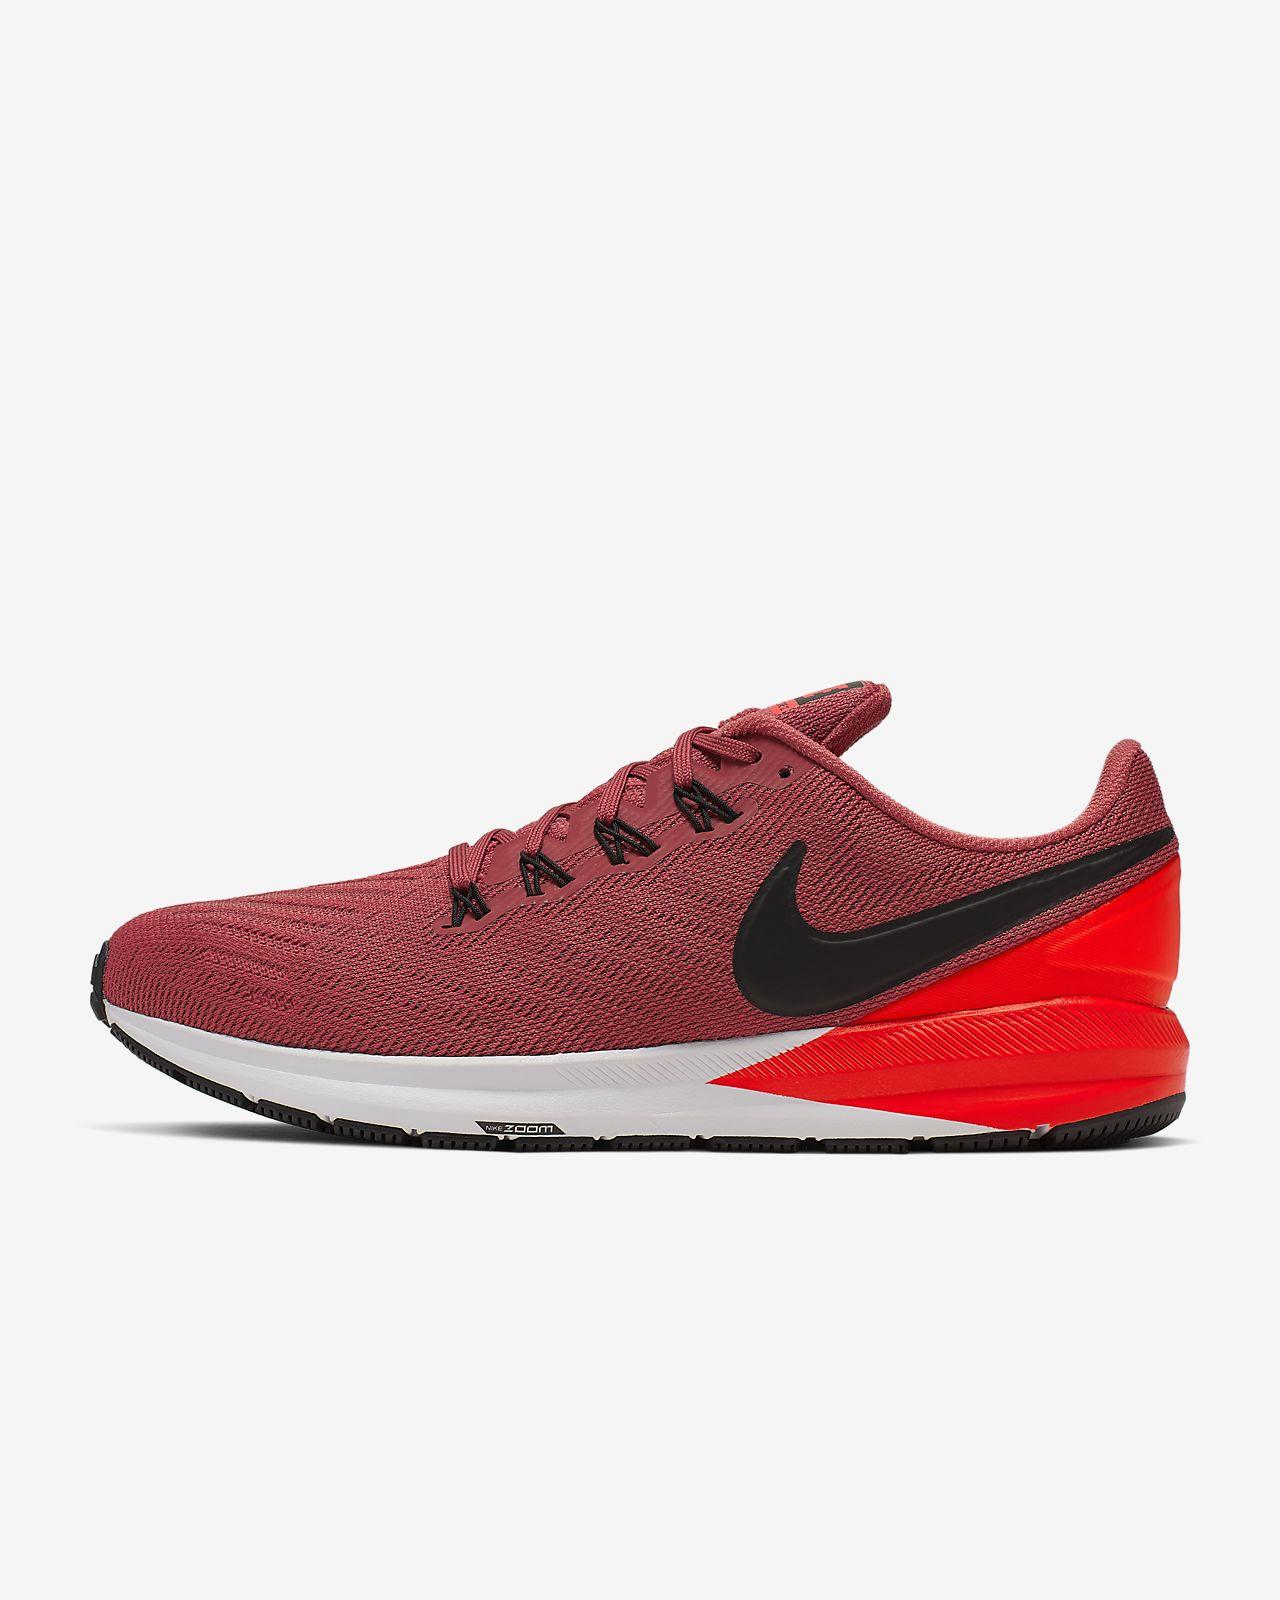 hot sale online 662c4 4b982 Nike Air Zoom Structure 22 Men's Running Shoe